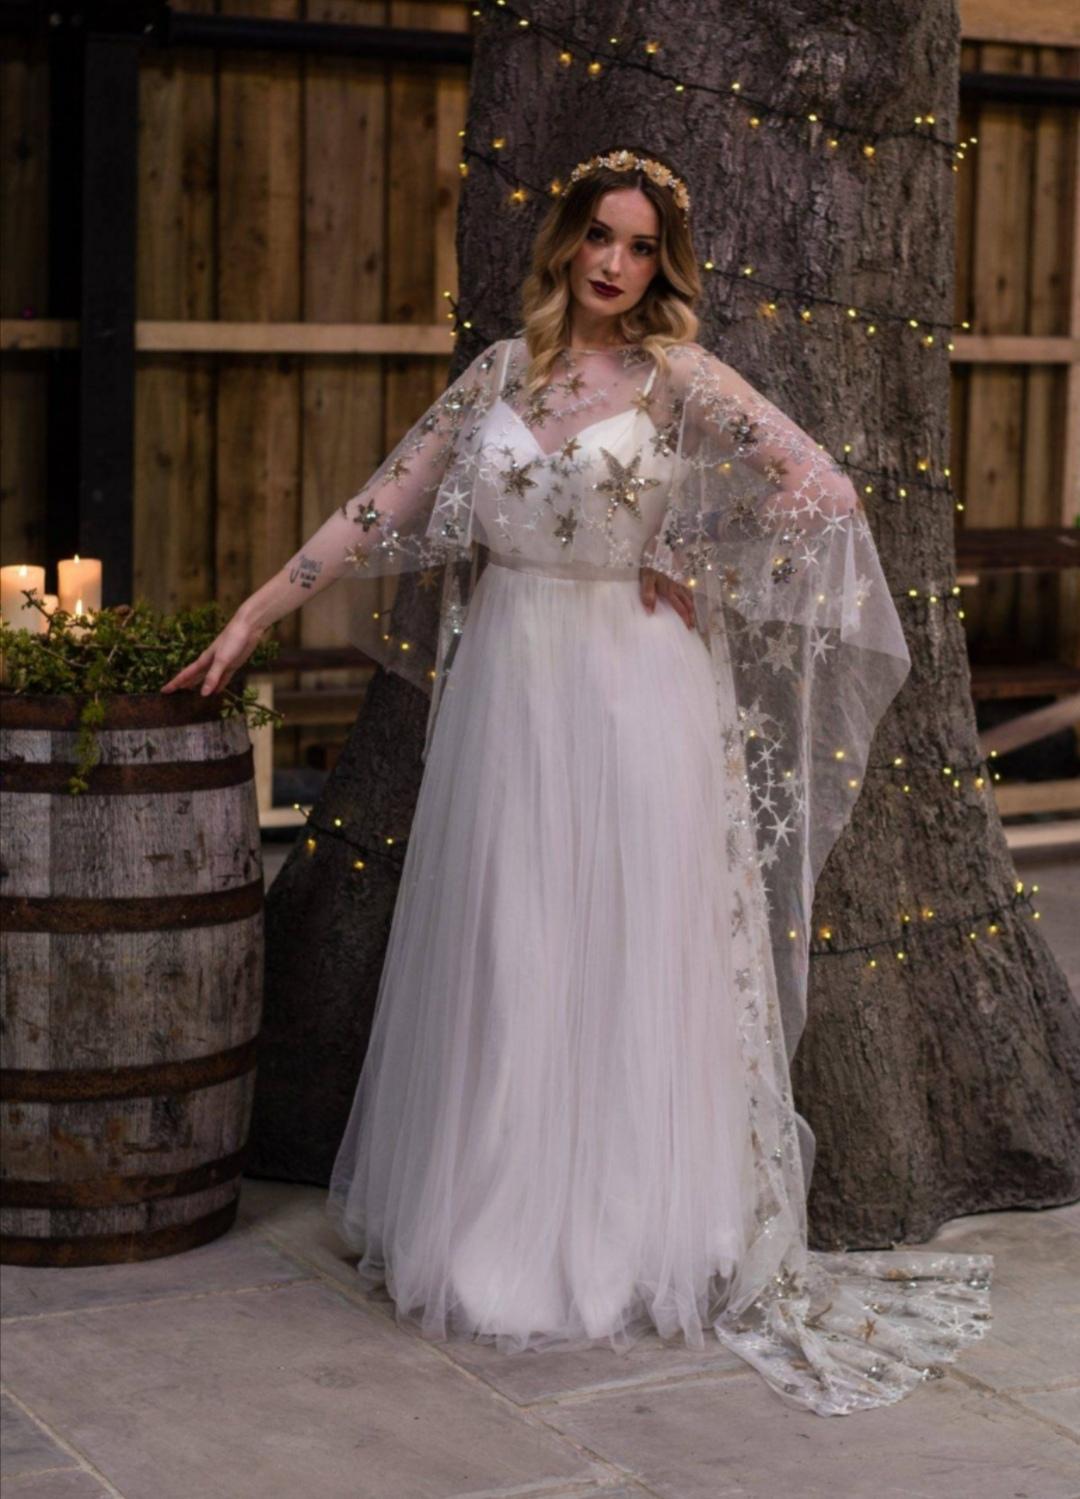 Gold wedding dress with stars